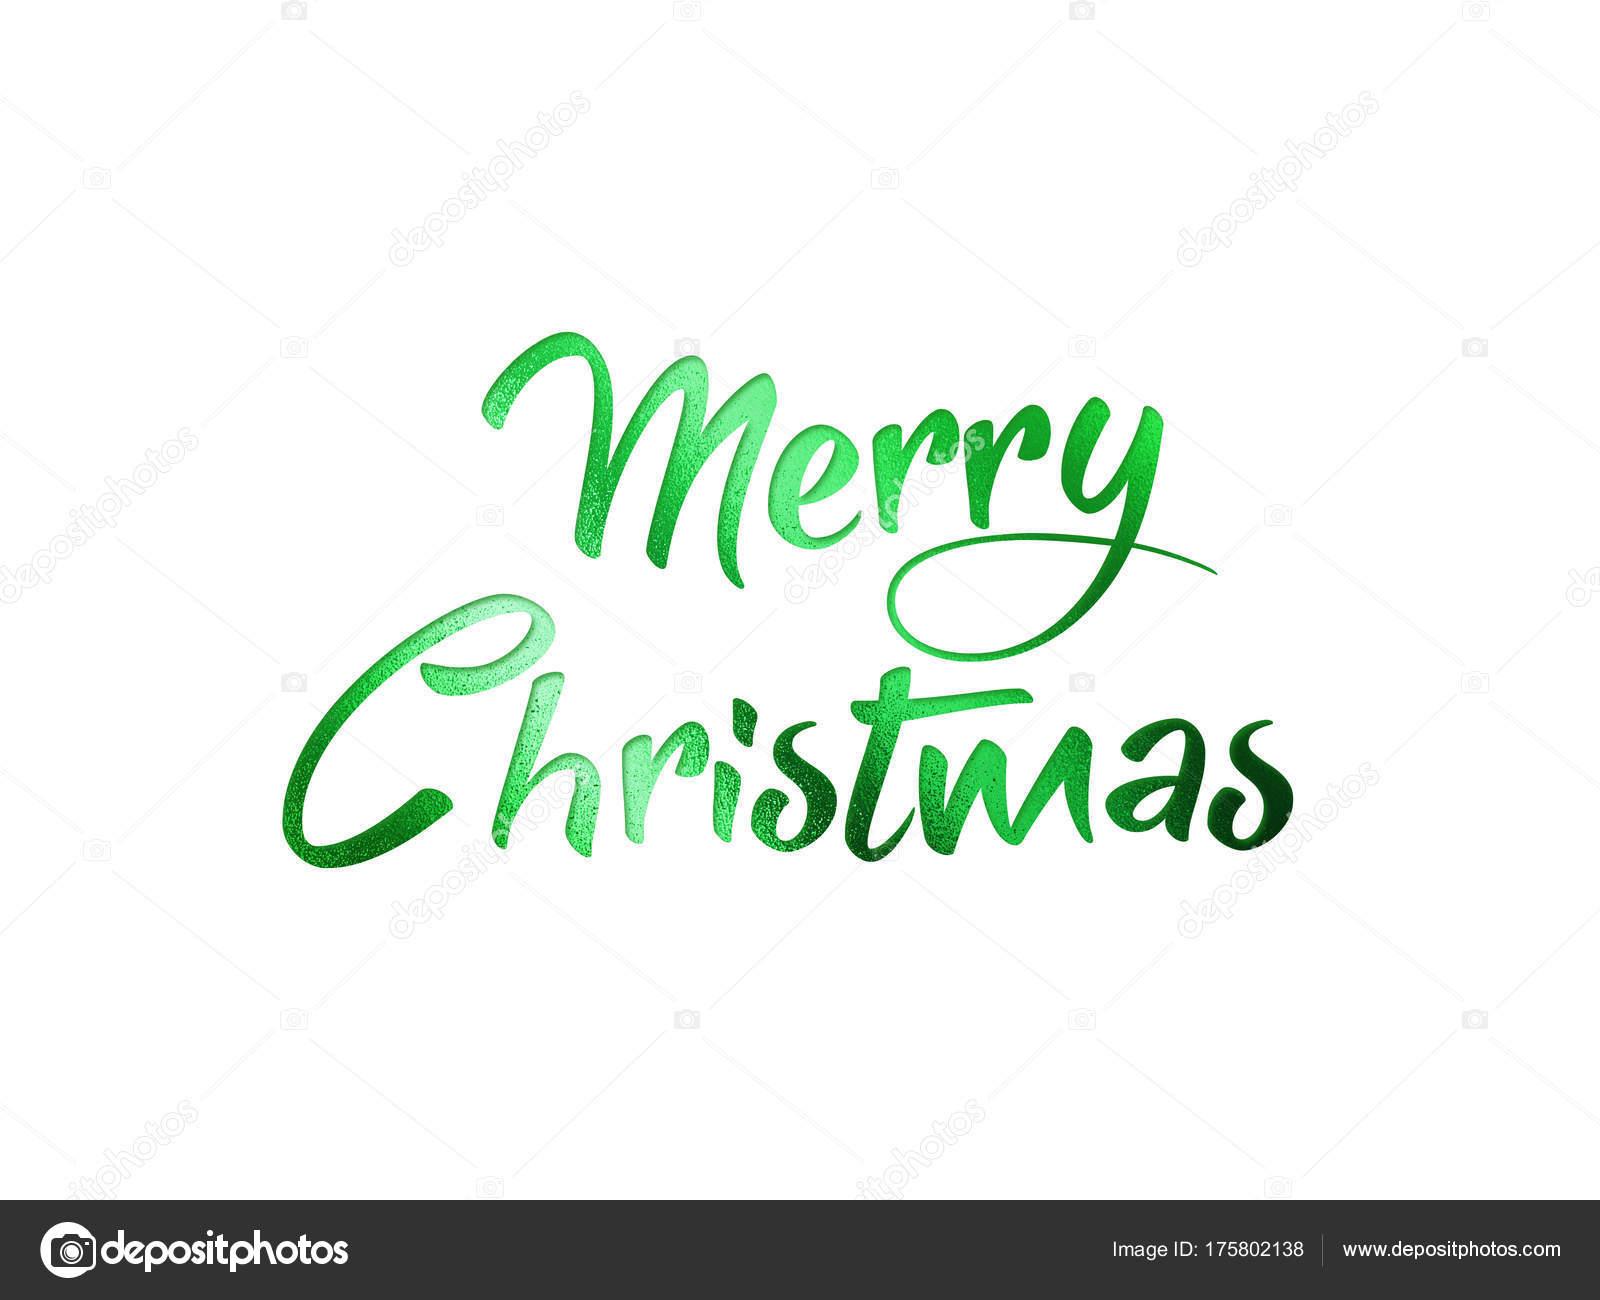 Merry Christmas Writing.Green Glitter Isolated Hand Writing Word Merry Christmas